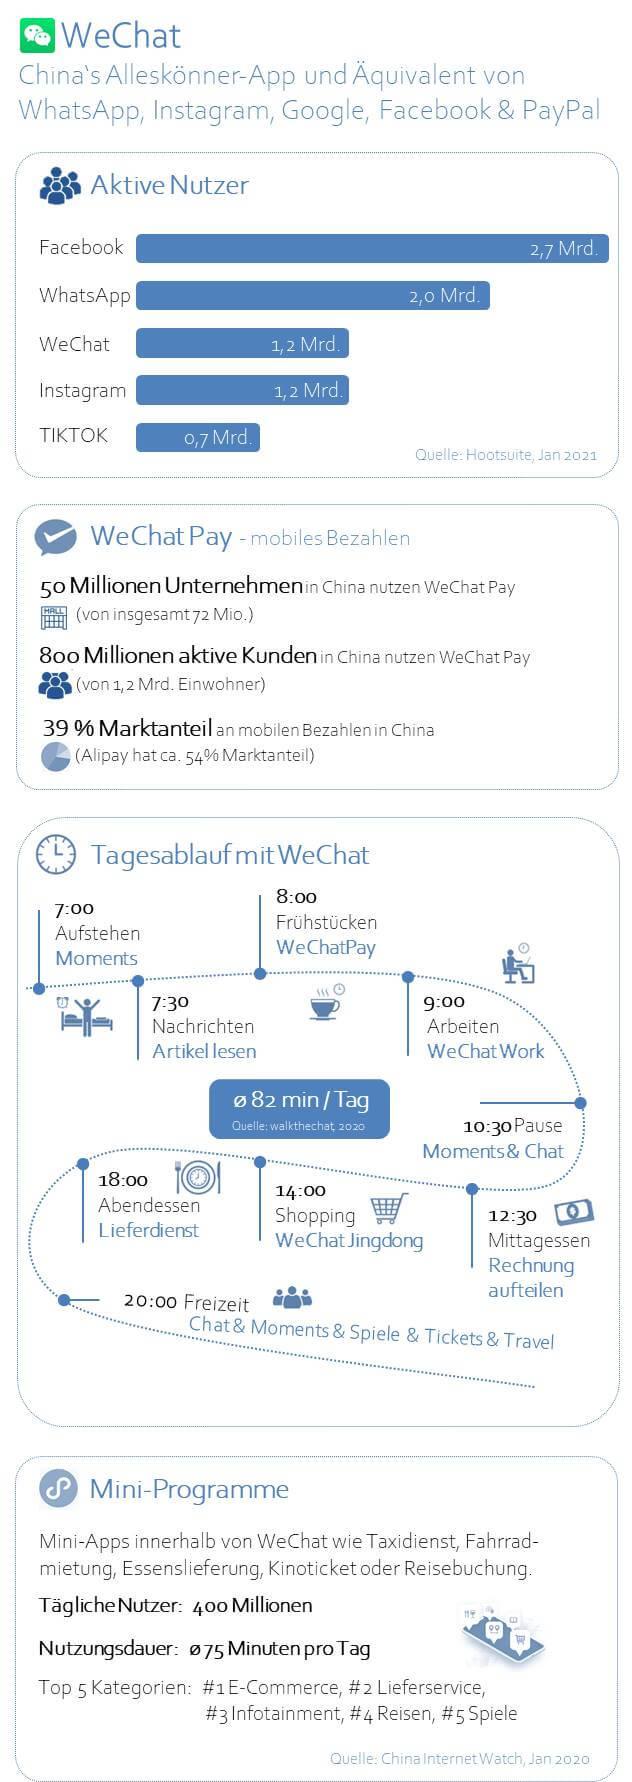 WeChat Infografik